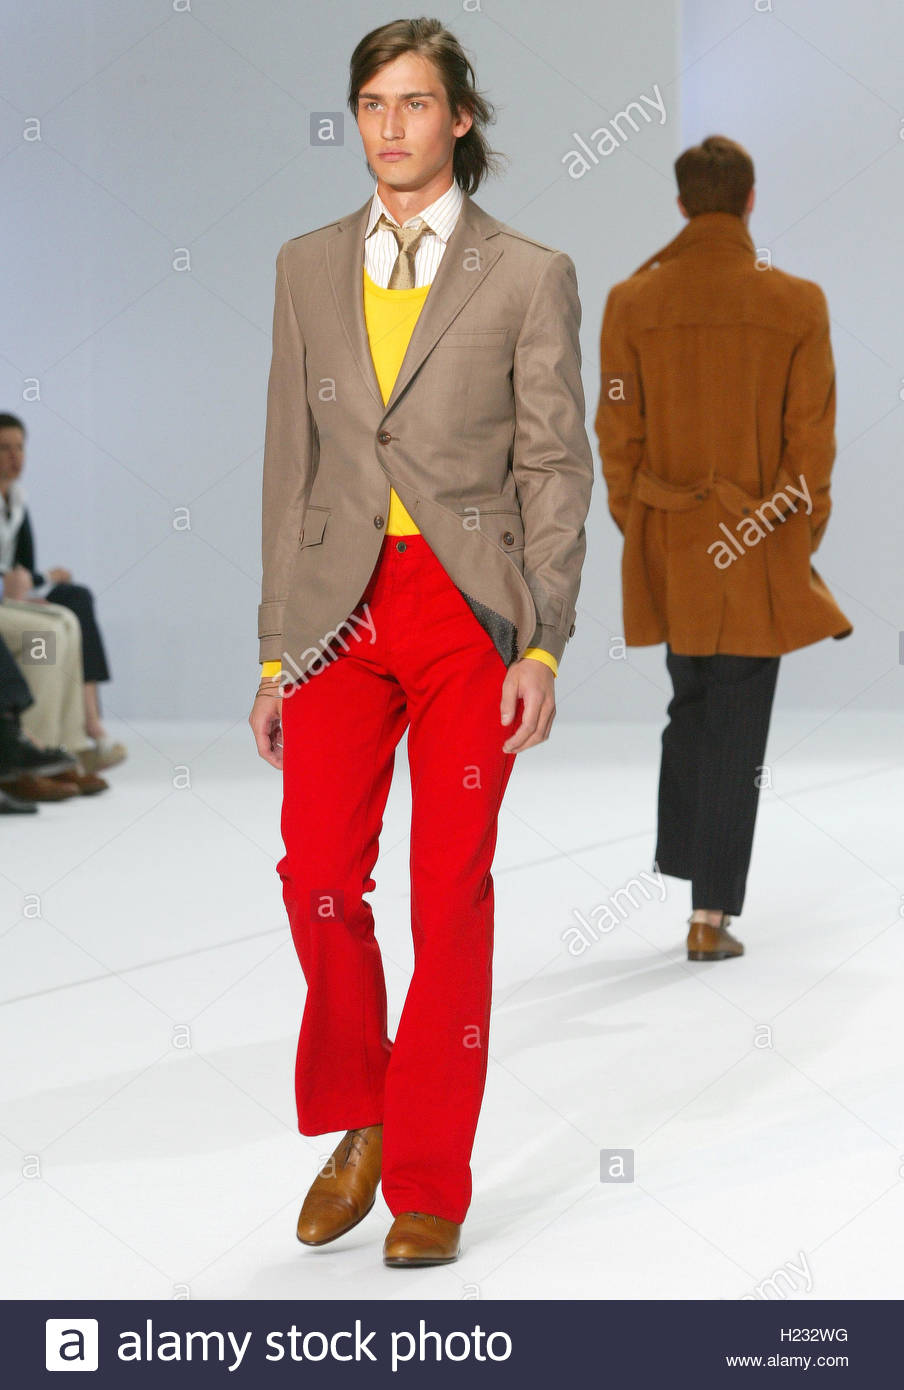 designer of givenchy 5q7f  Model presents creation by British designer Oswald Boateng for Givenchy  men's Spring/Summer 2006 fashion